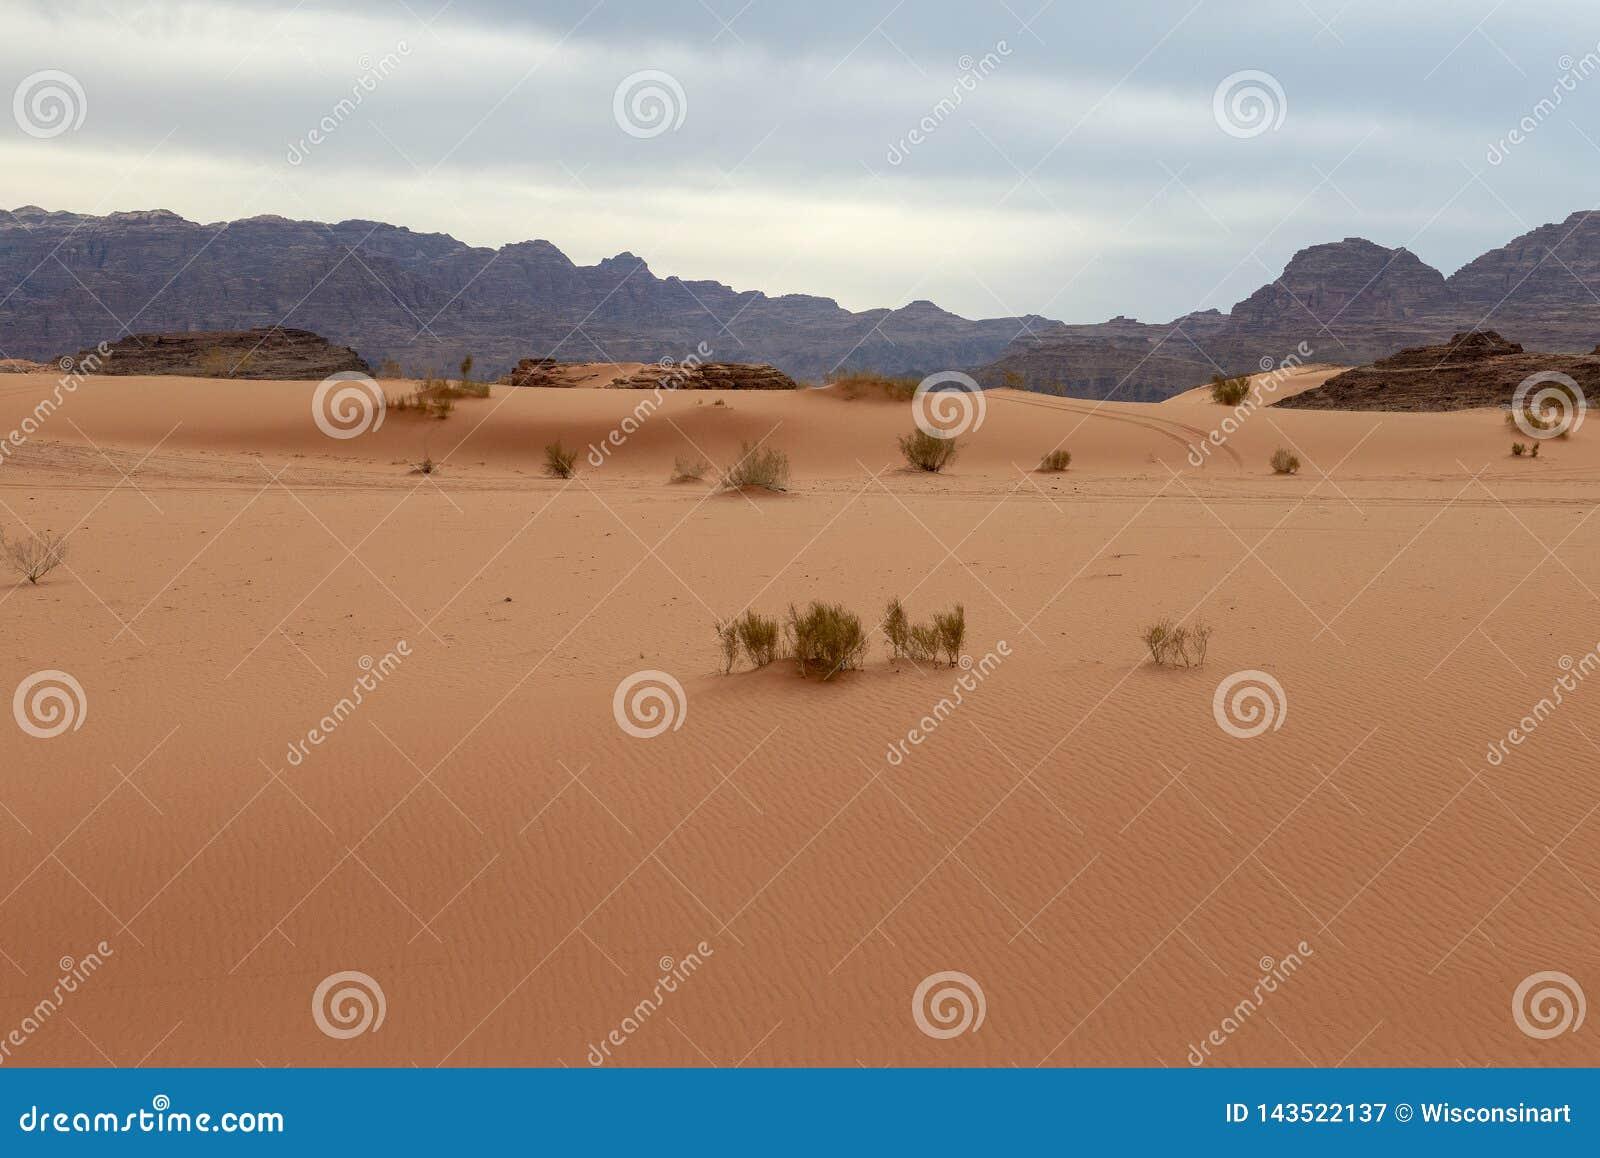 Wadi Run Desert, Jordan Travel, natureza